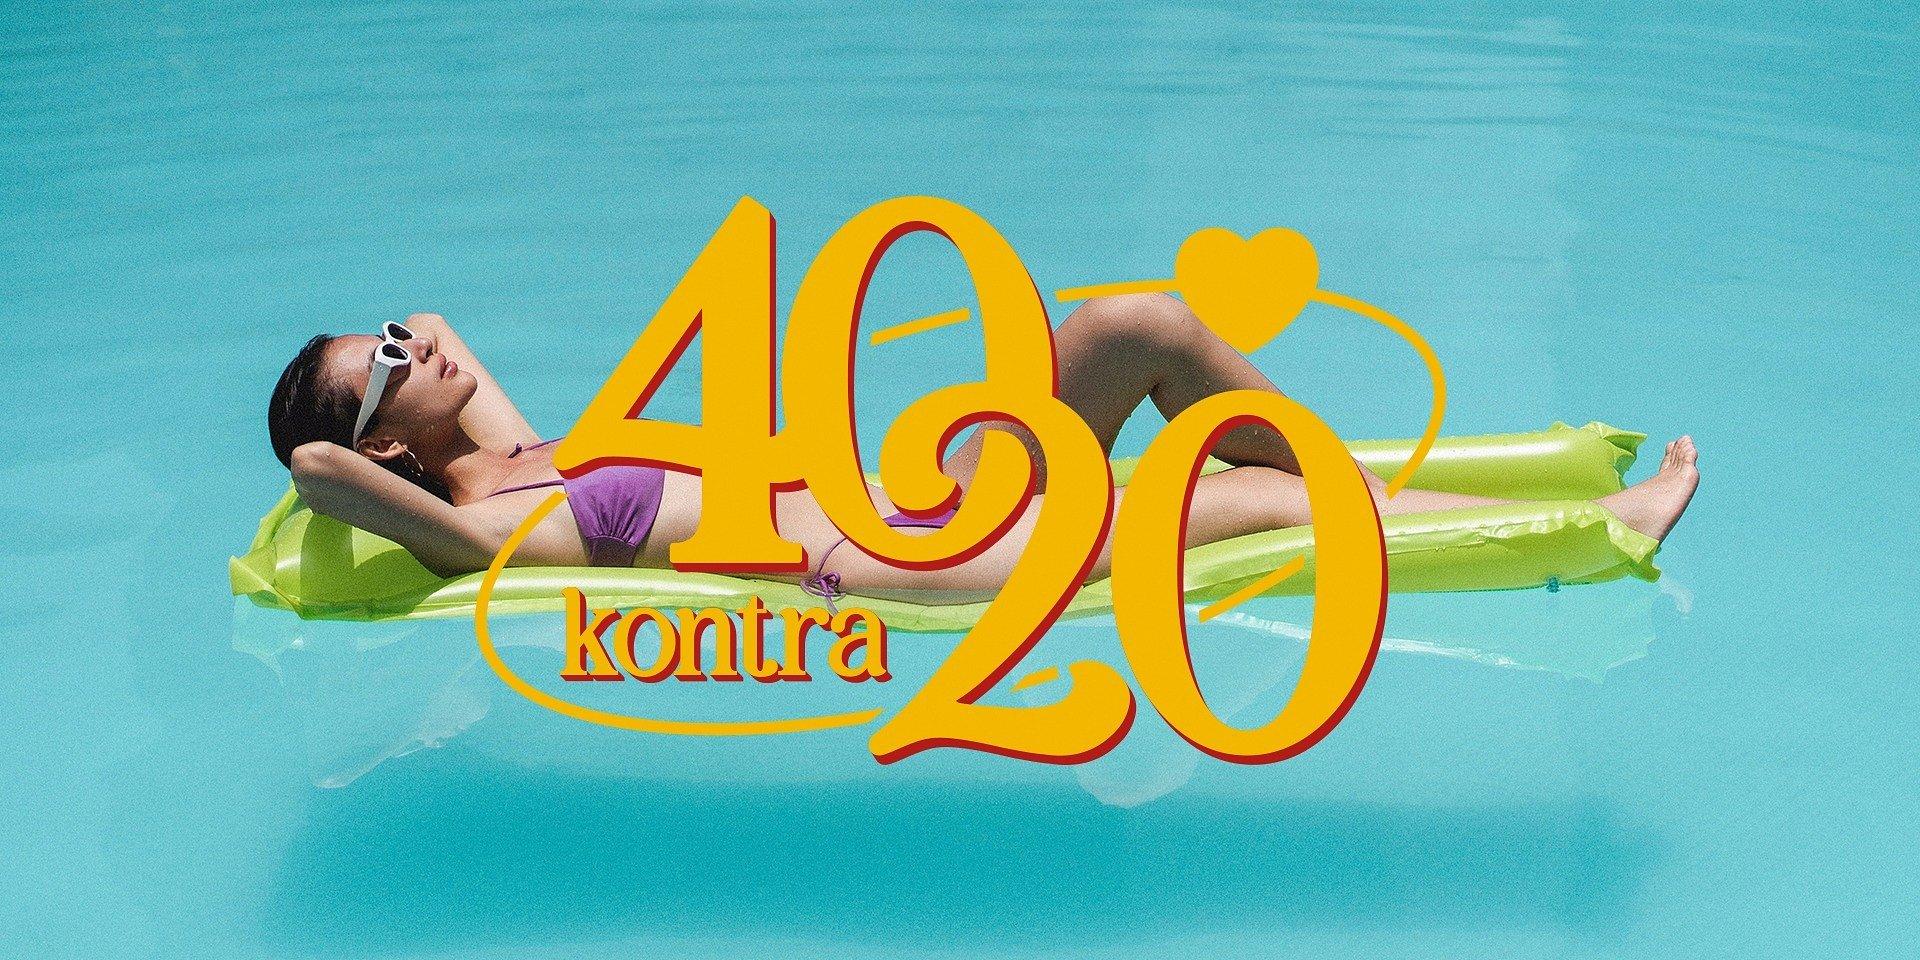 """40 kontra 20"": Magda i Kinga kolejnymi bohaterkami programu!"